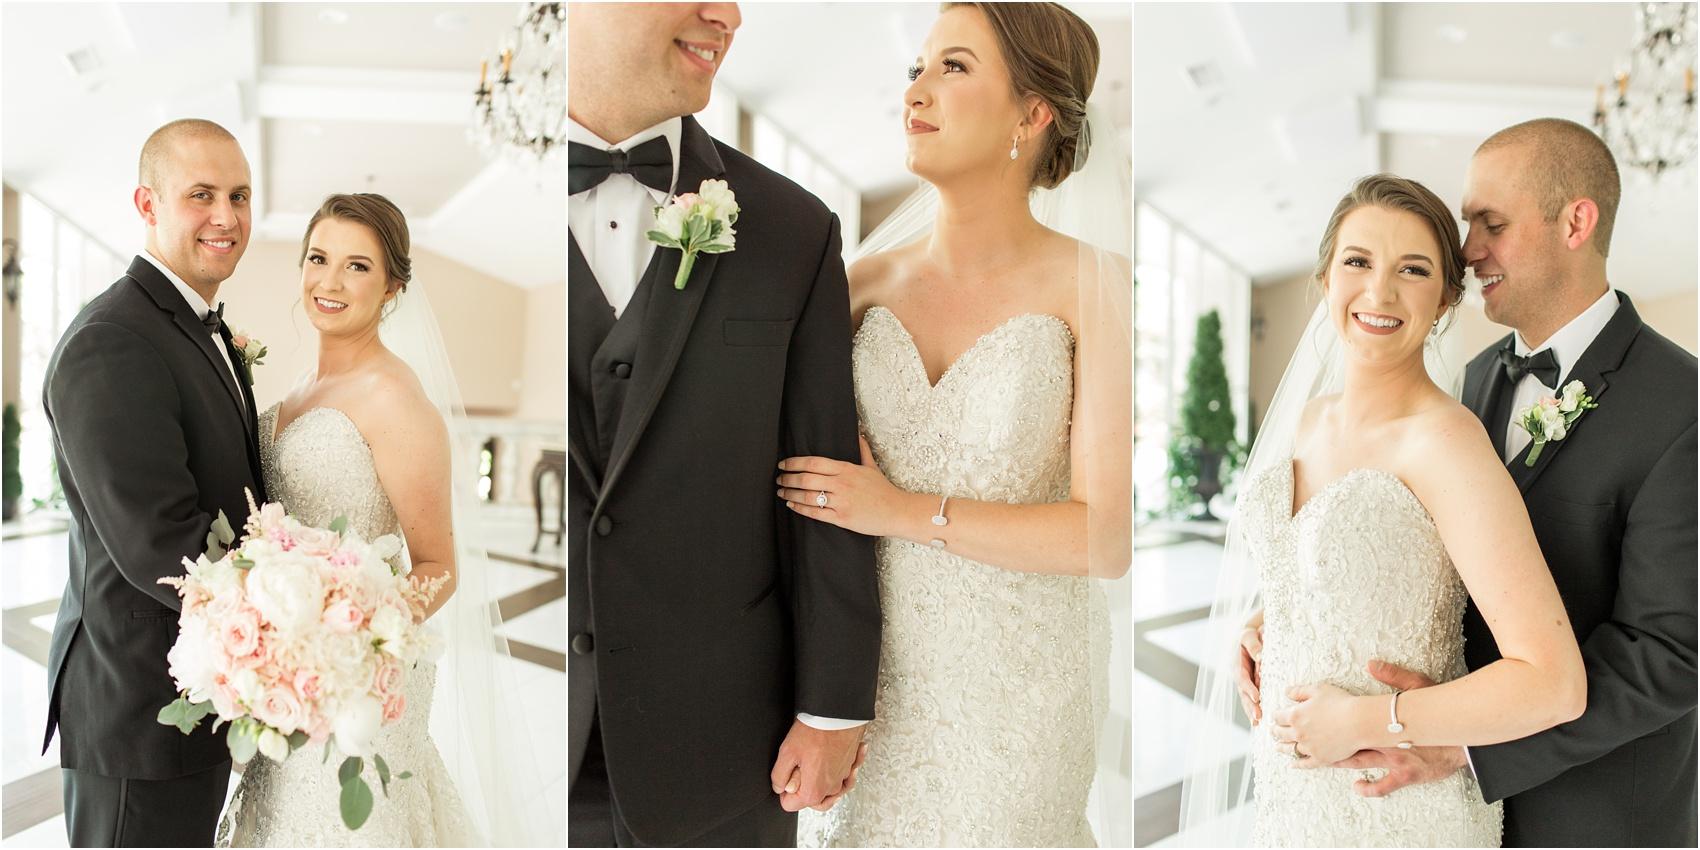 Savannah Eve Photography- Nutt Wedding- Blog-32.jpg